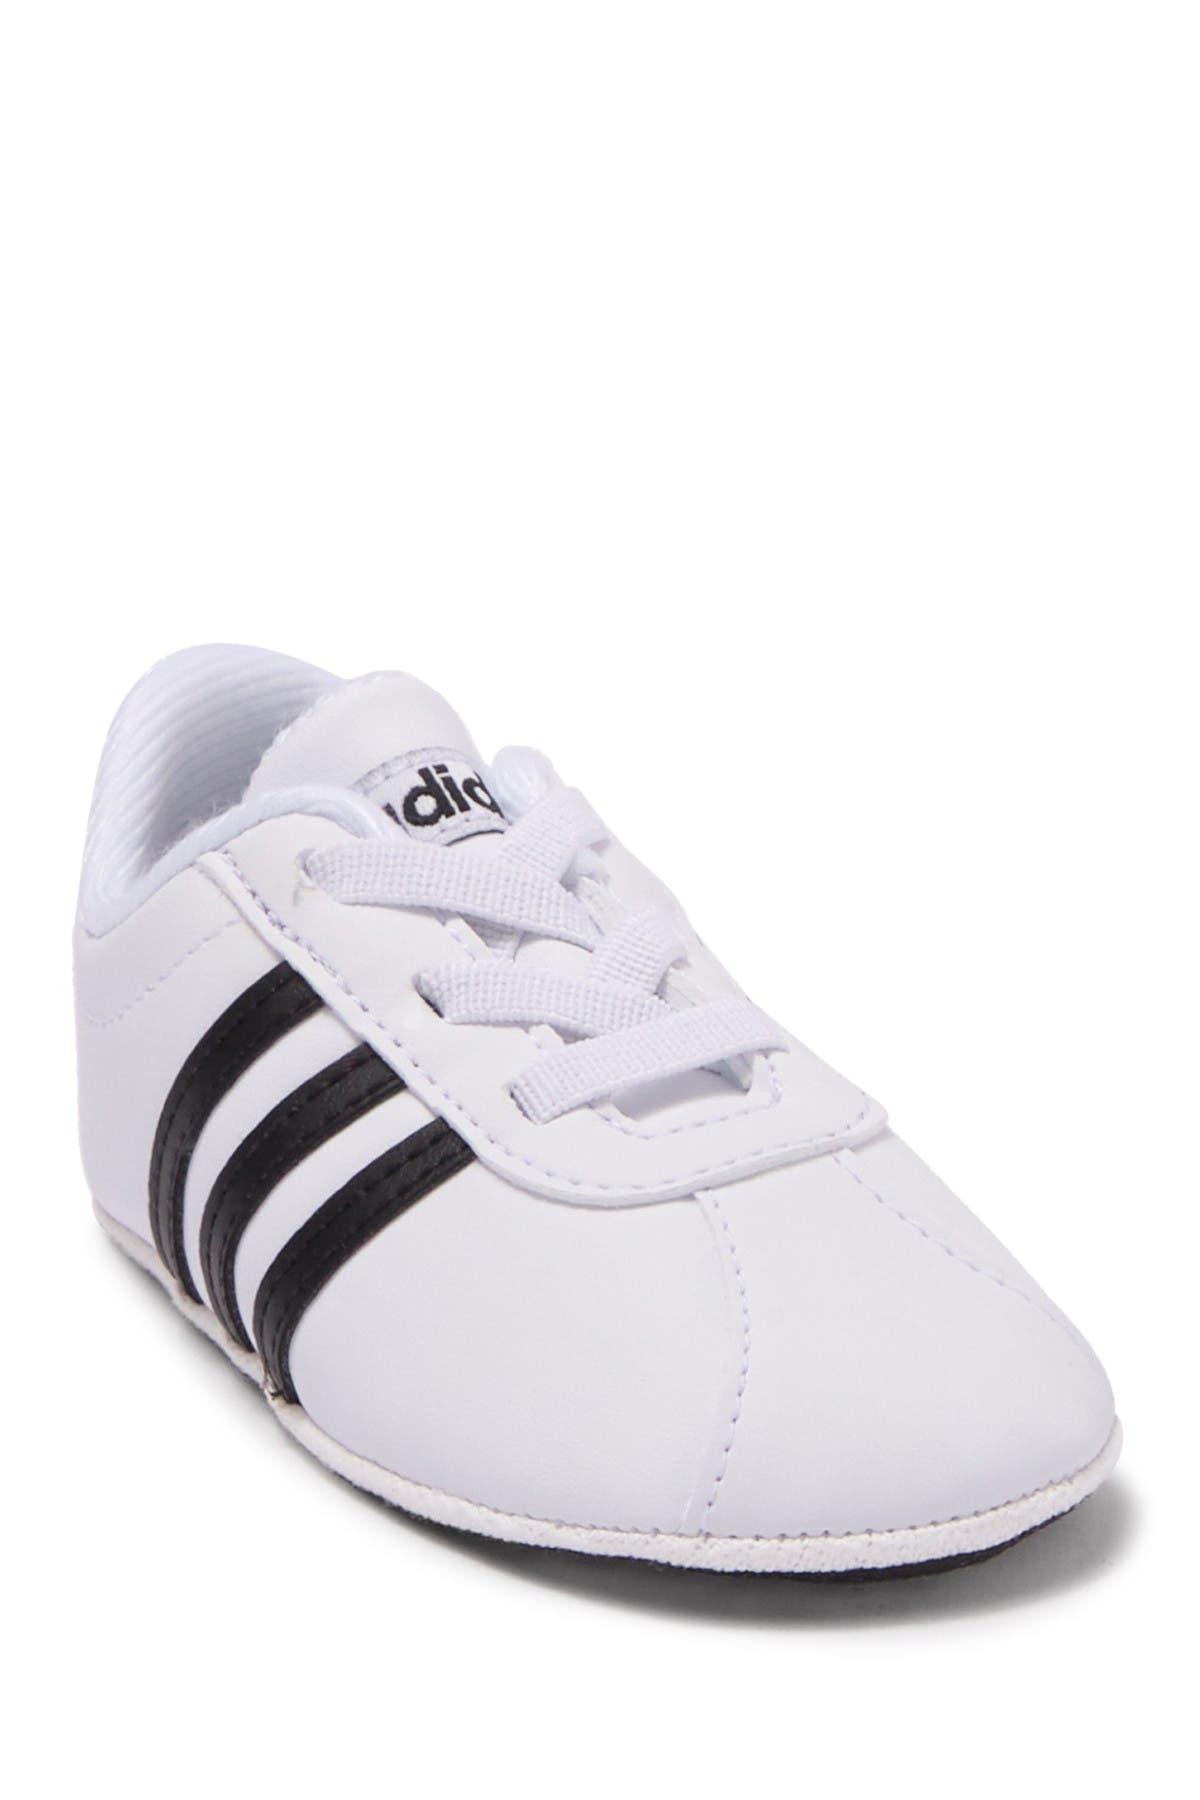 adidas   VL Court 2.0 Crib Shoe